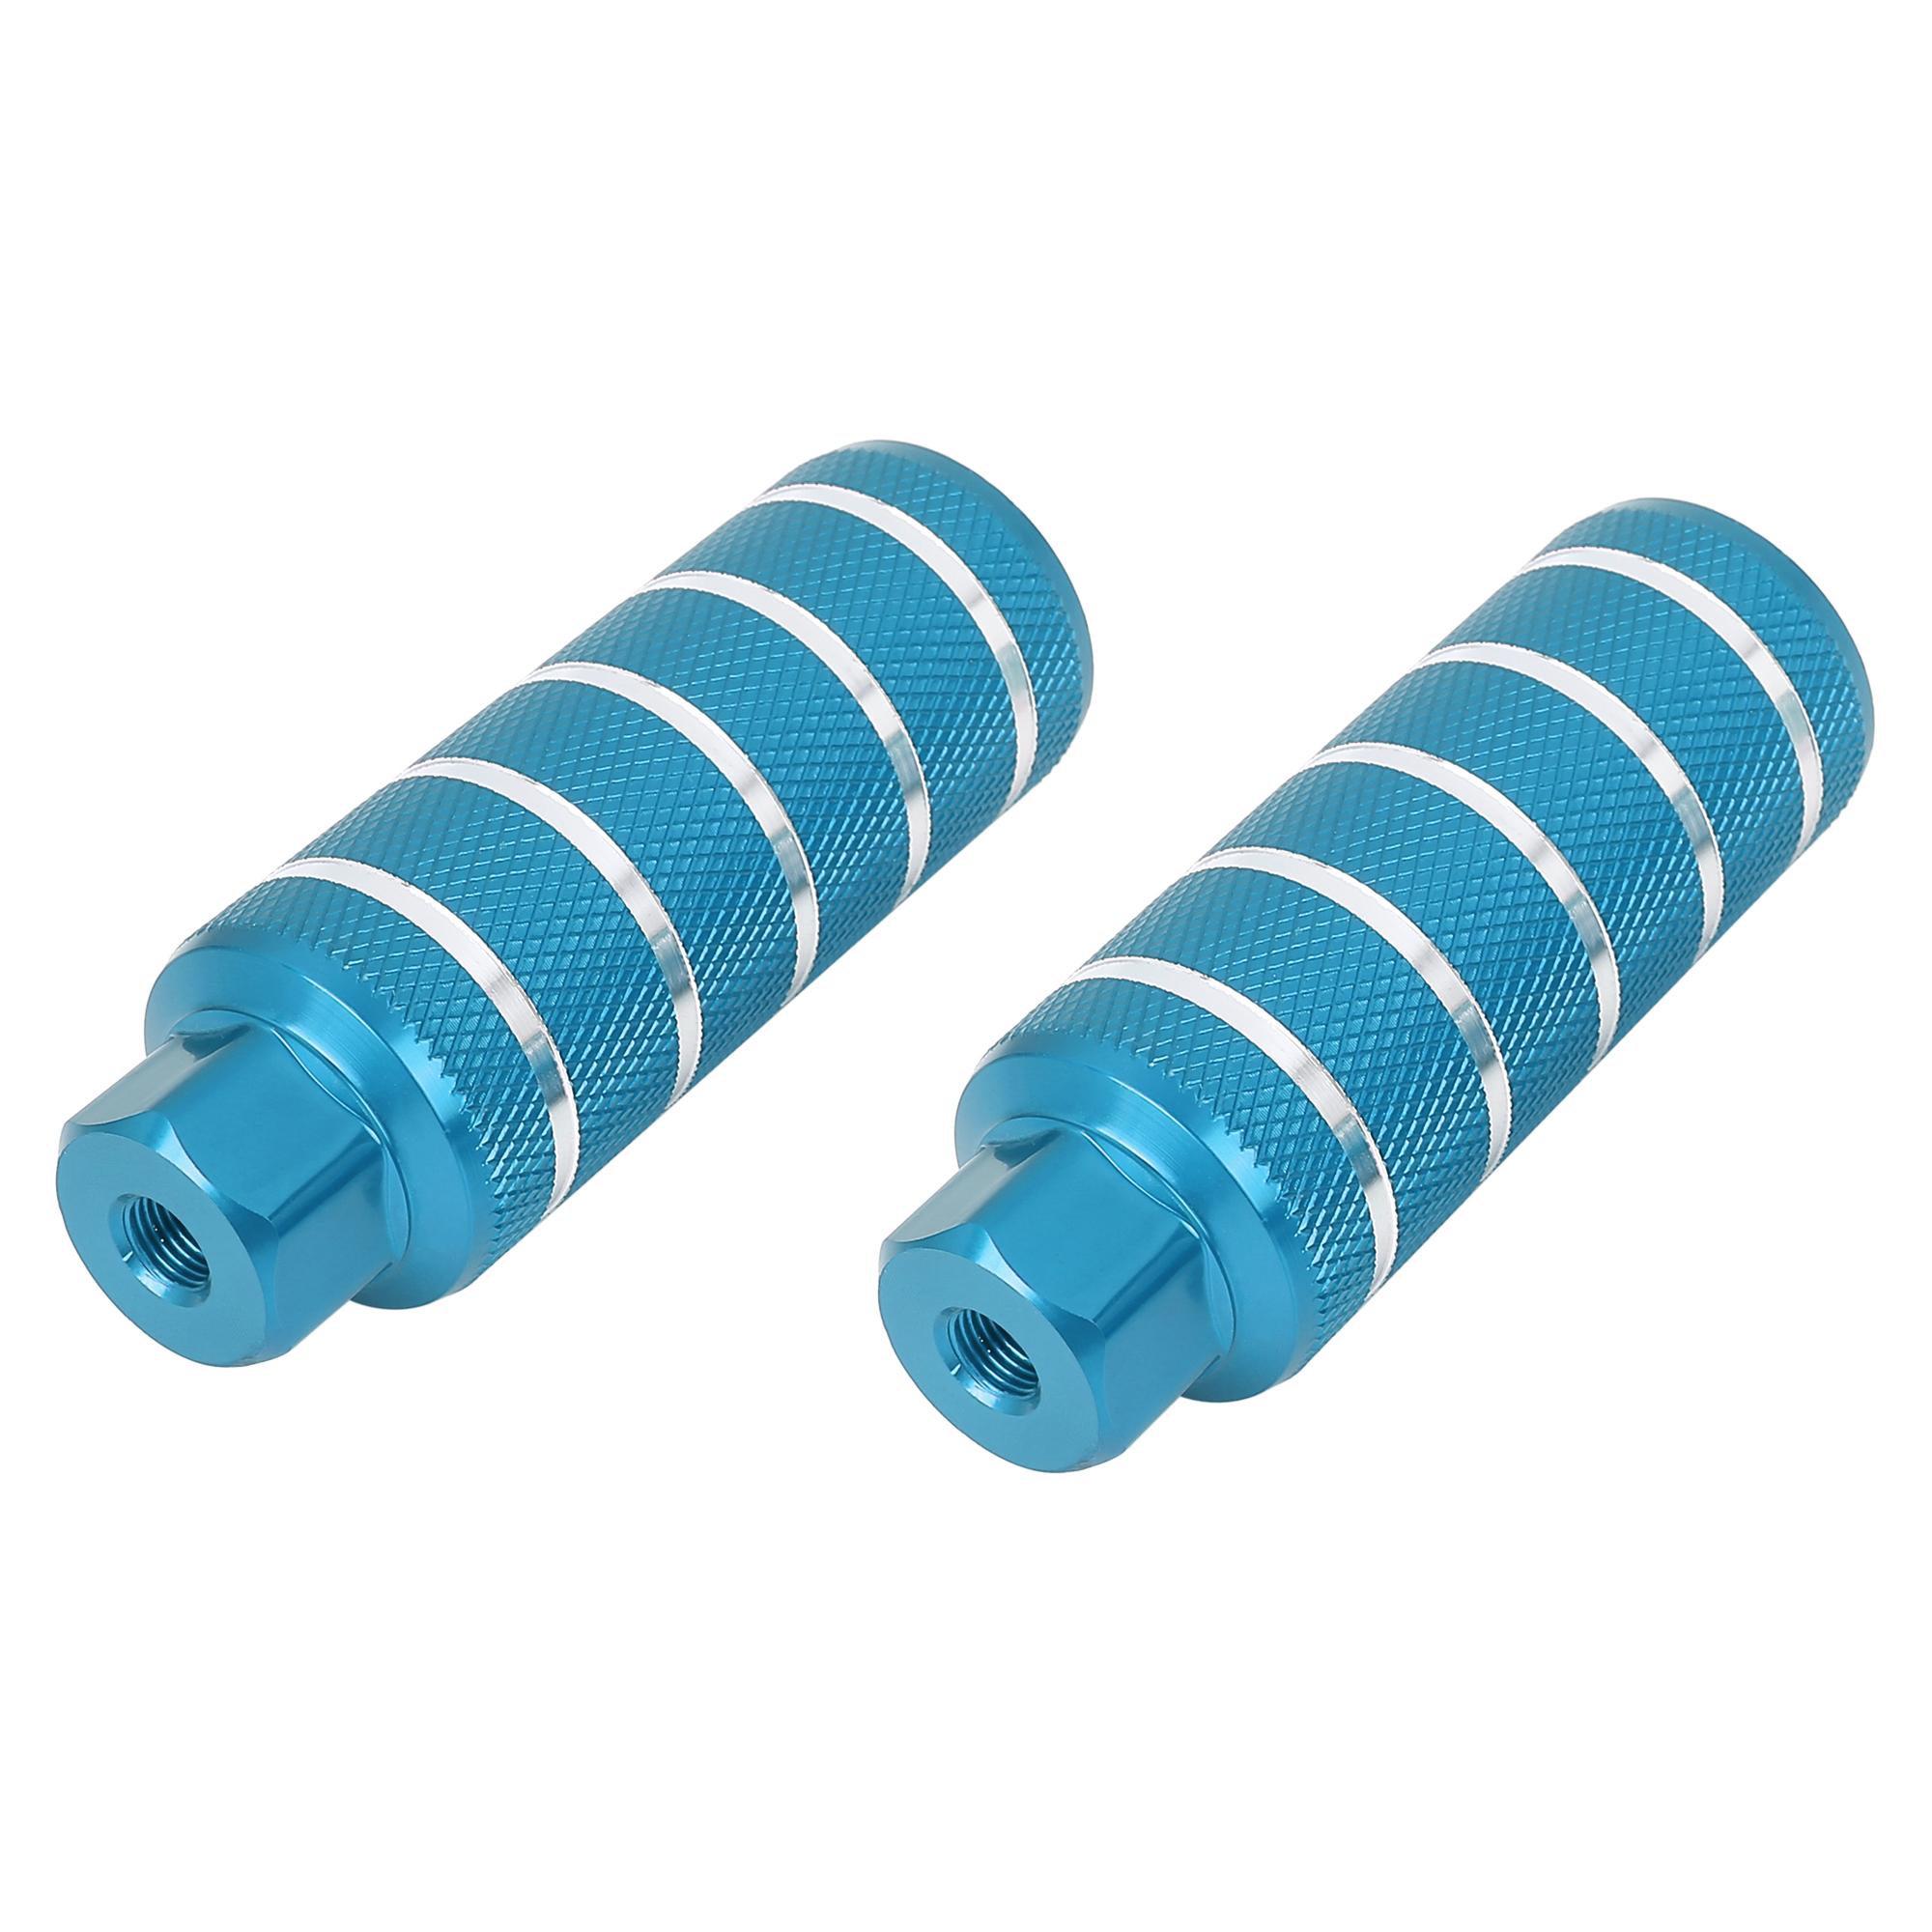 Pair Aluminum Alloy Stripe Cylinder Bike Axle Rear Foot Pegs Sky Blue